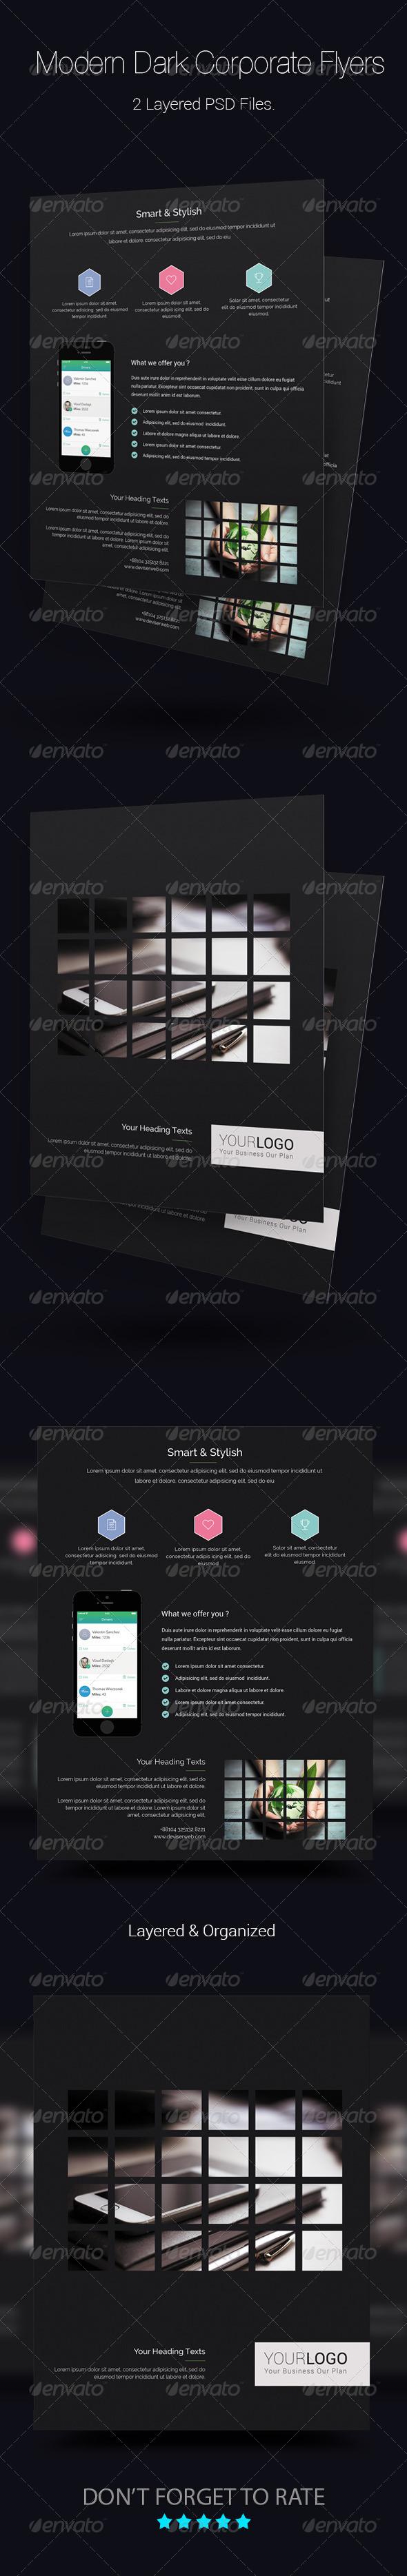 GraphicRiver Modern Dark Corporate Flyer Templates 8618326